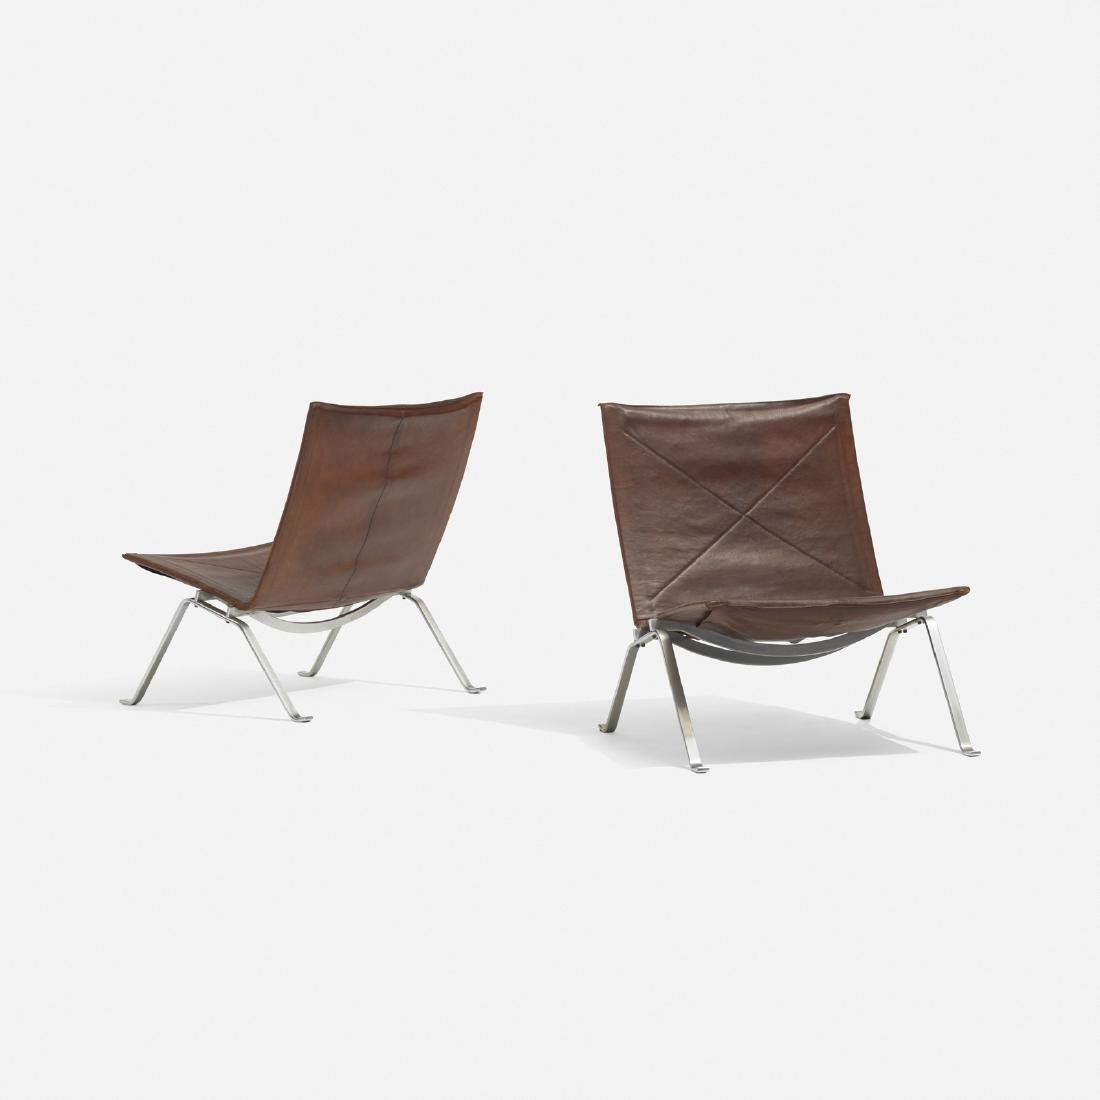 Poul Kjaerholm, PK 22 lounge chairs, pair